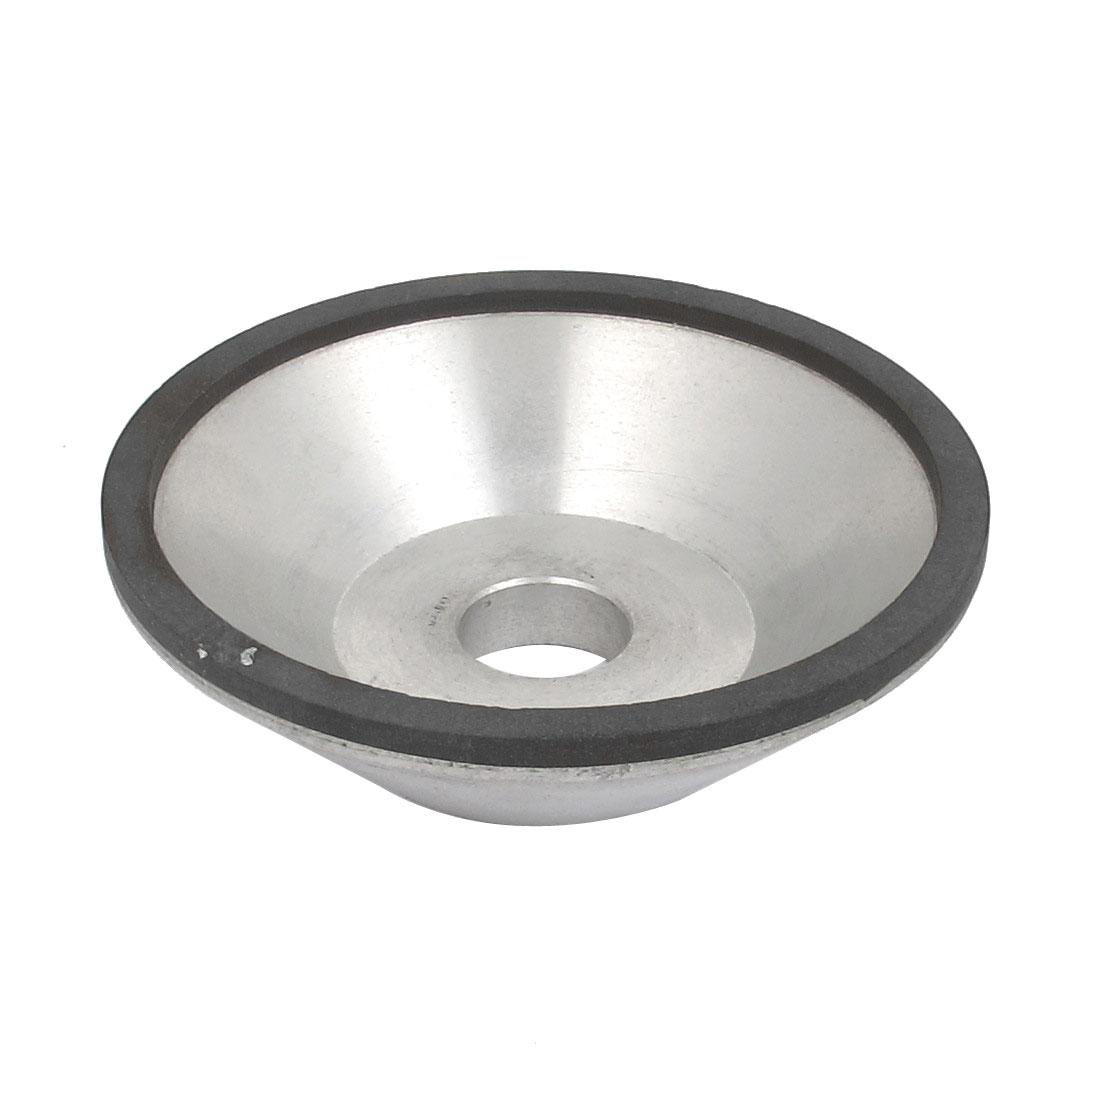 100mm Dia Bowl Shape Diamond Grinding Wheel Grinder